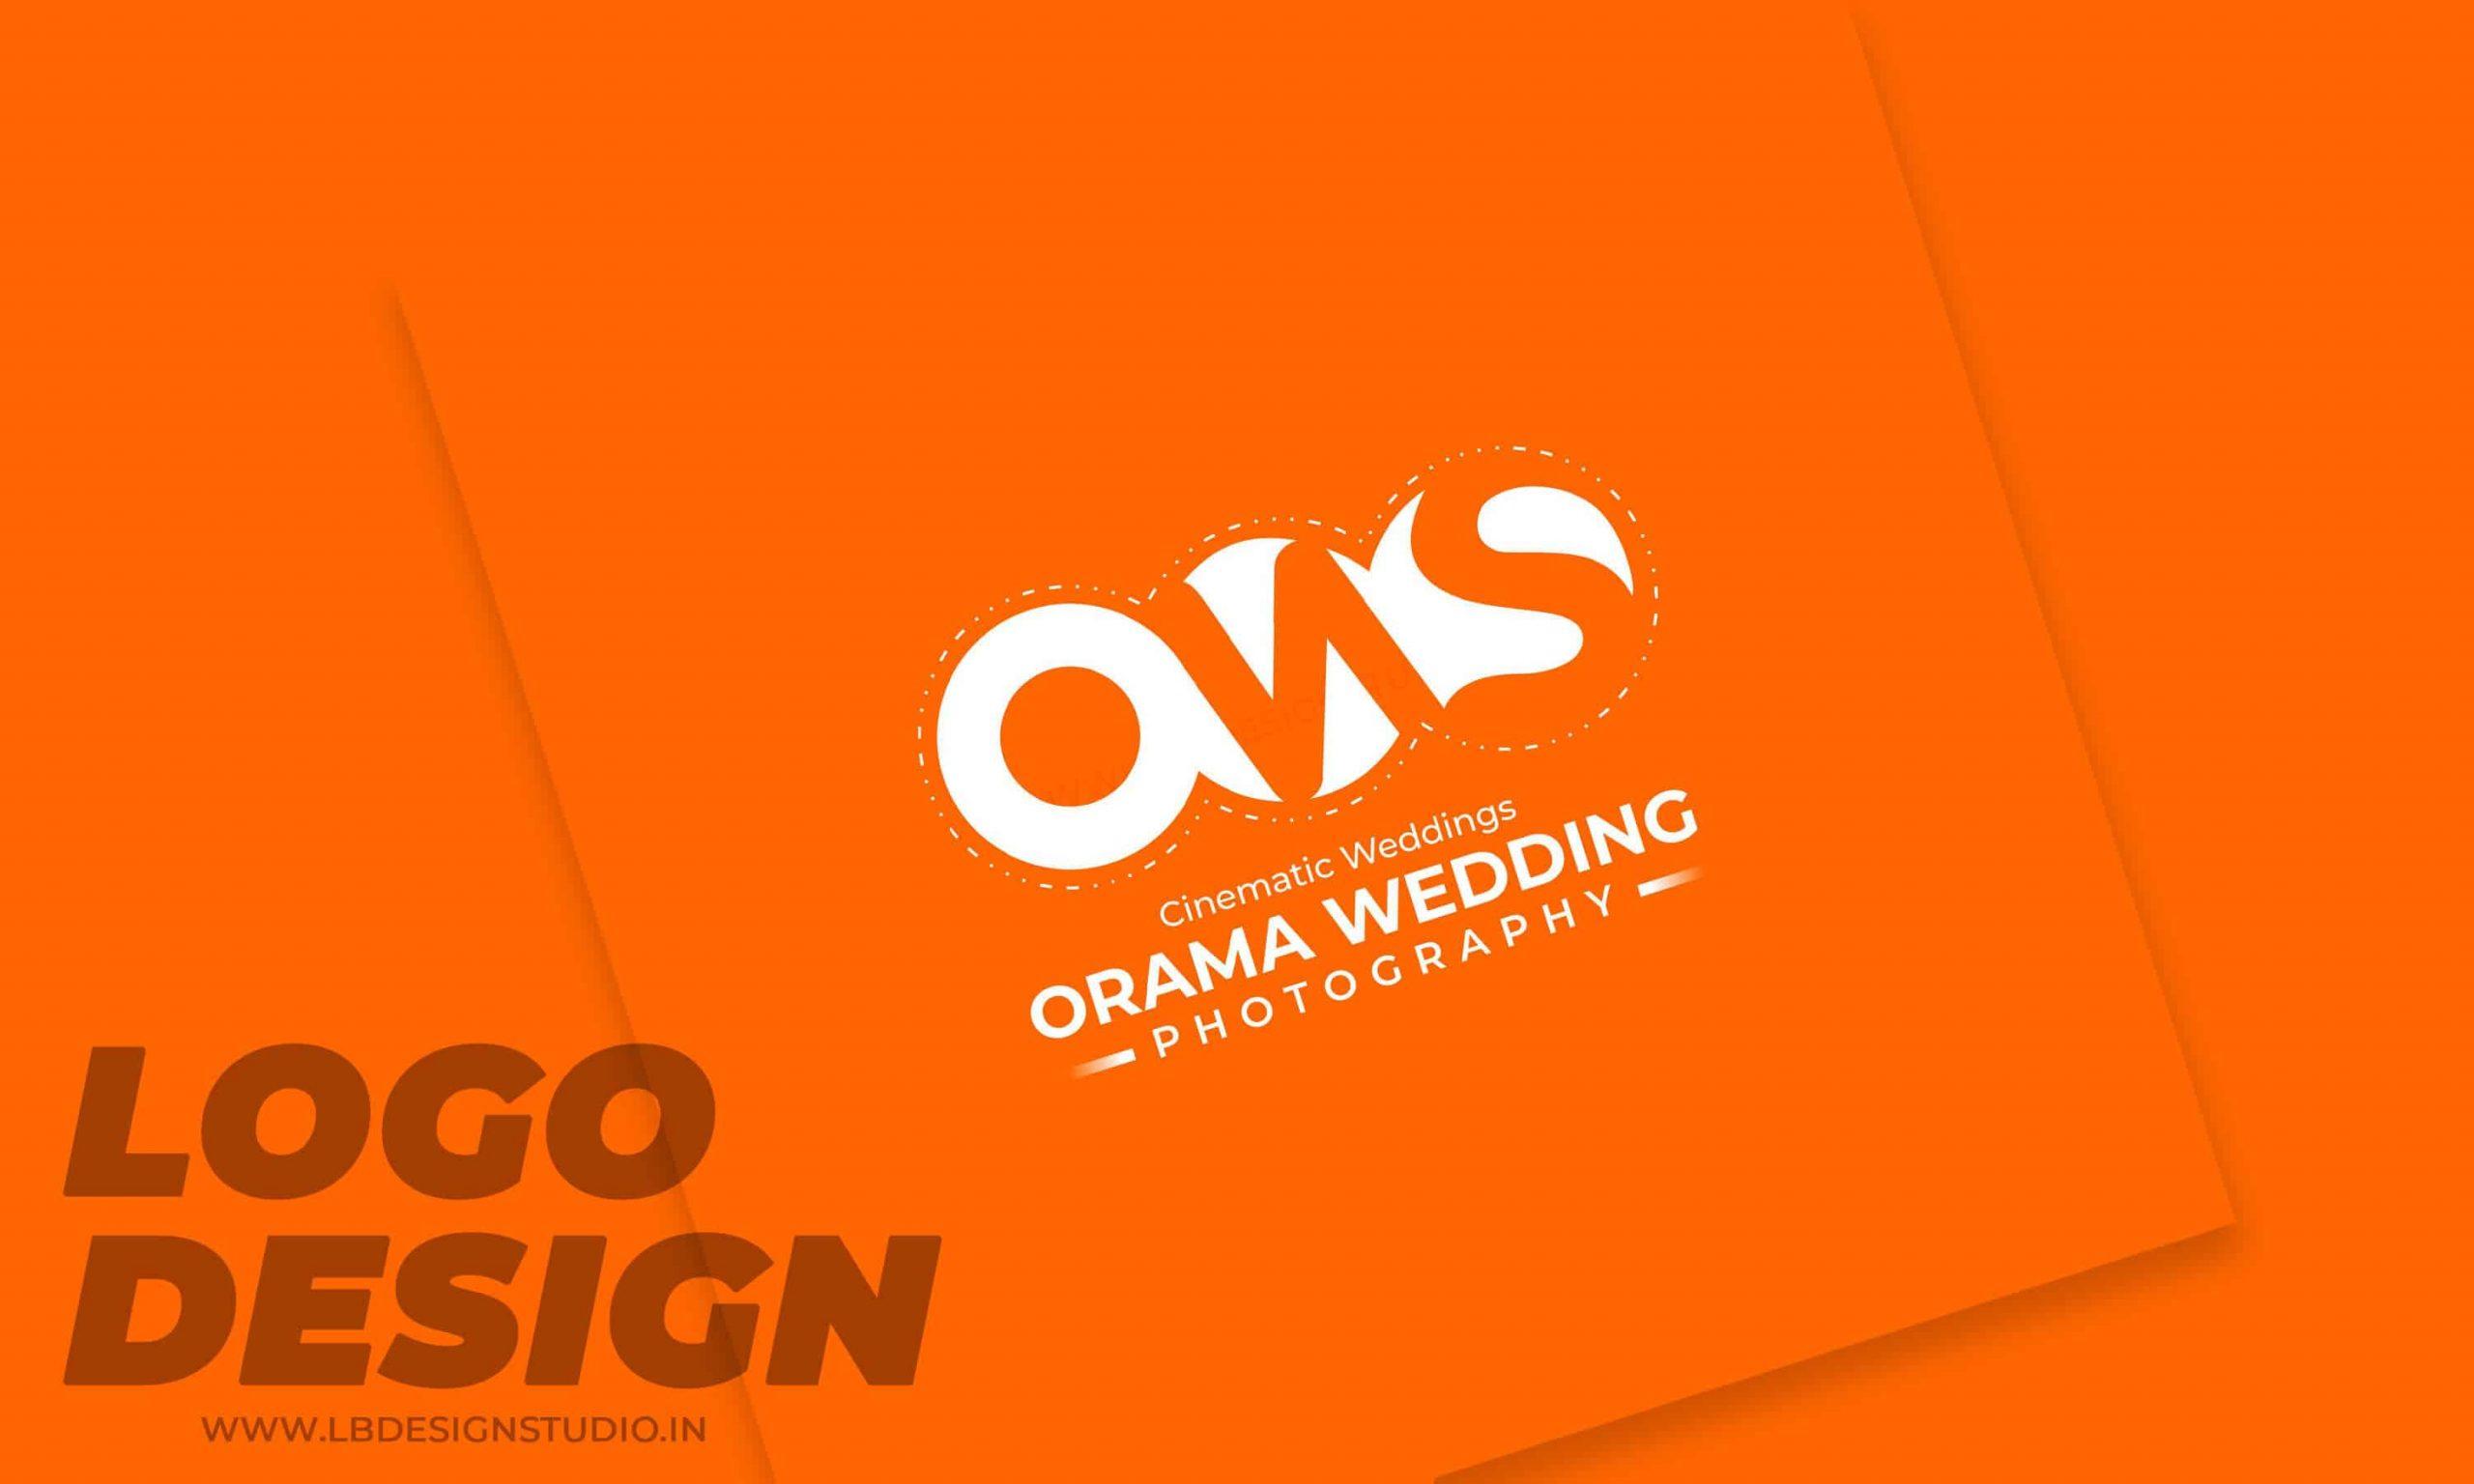 logo design madurai, photography logo design, design a photography logo, wedding photography logo design, aws logo design